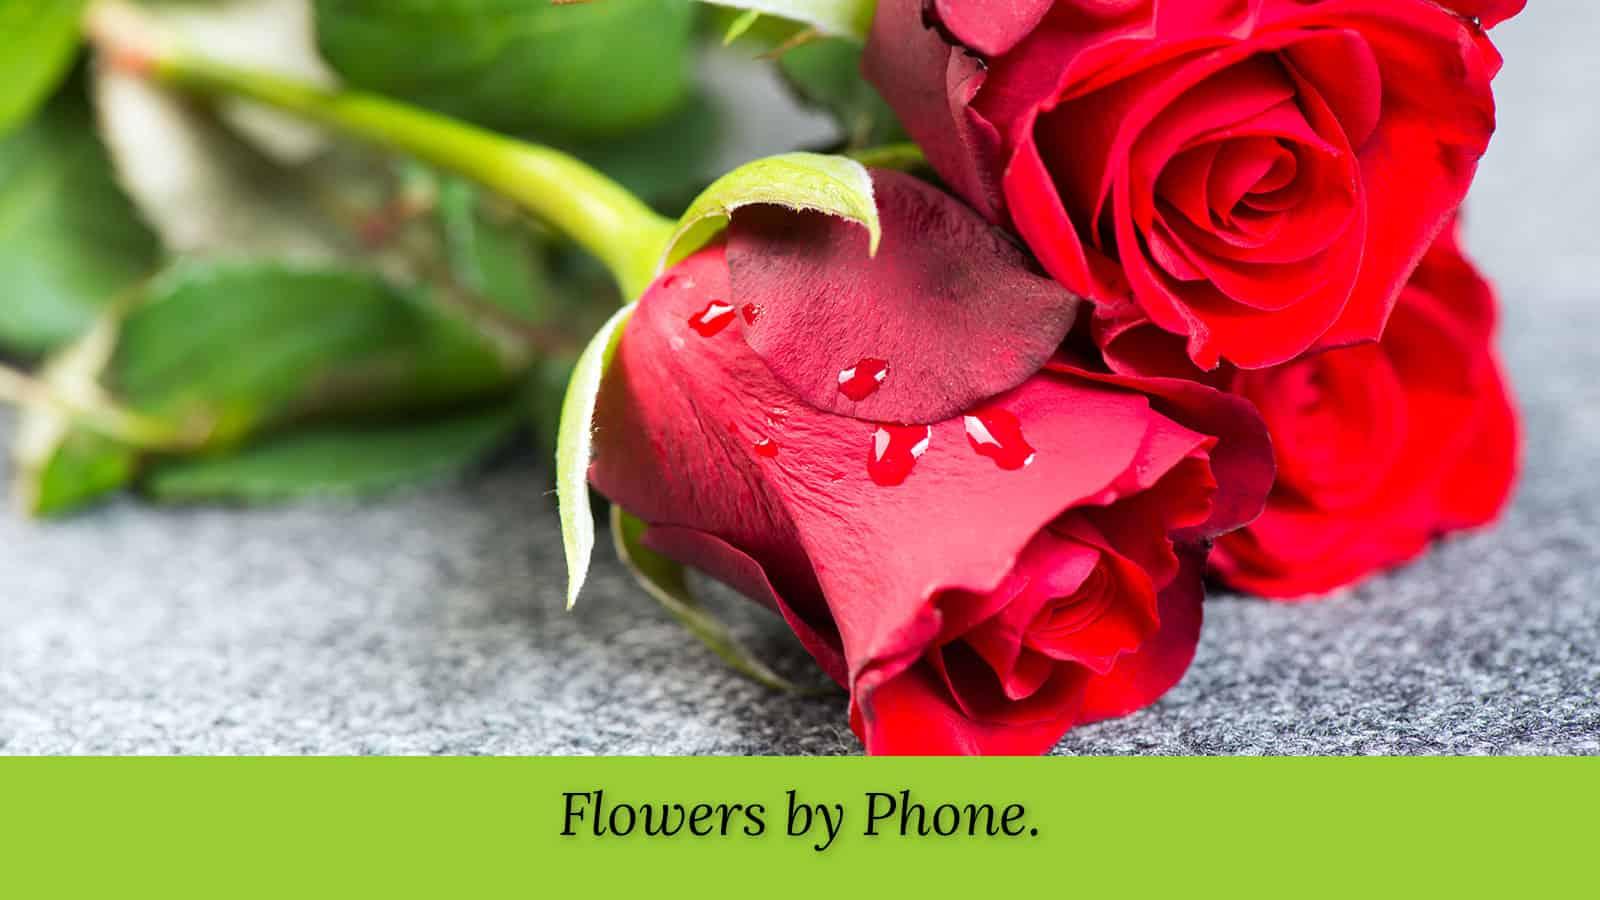 wmp-carousel-flowers-lora